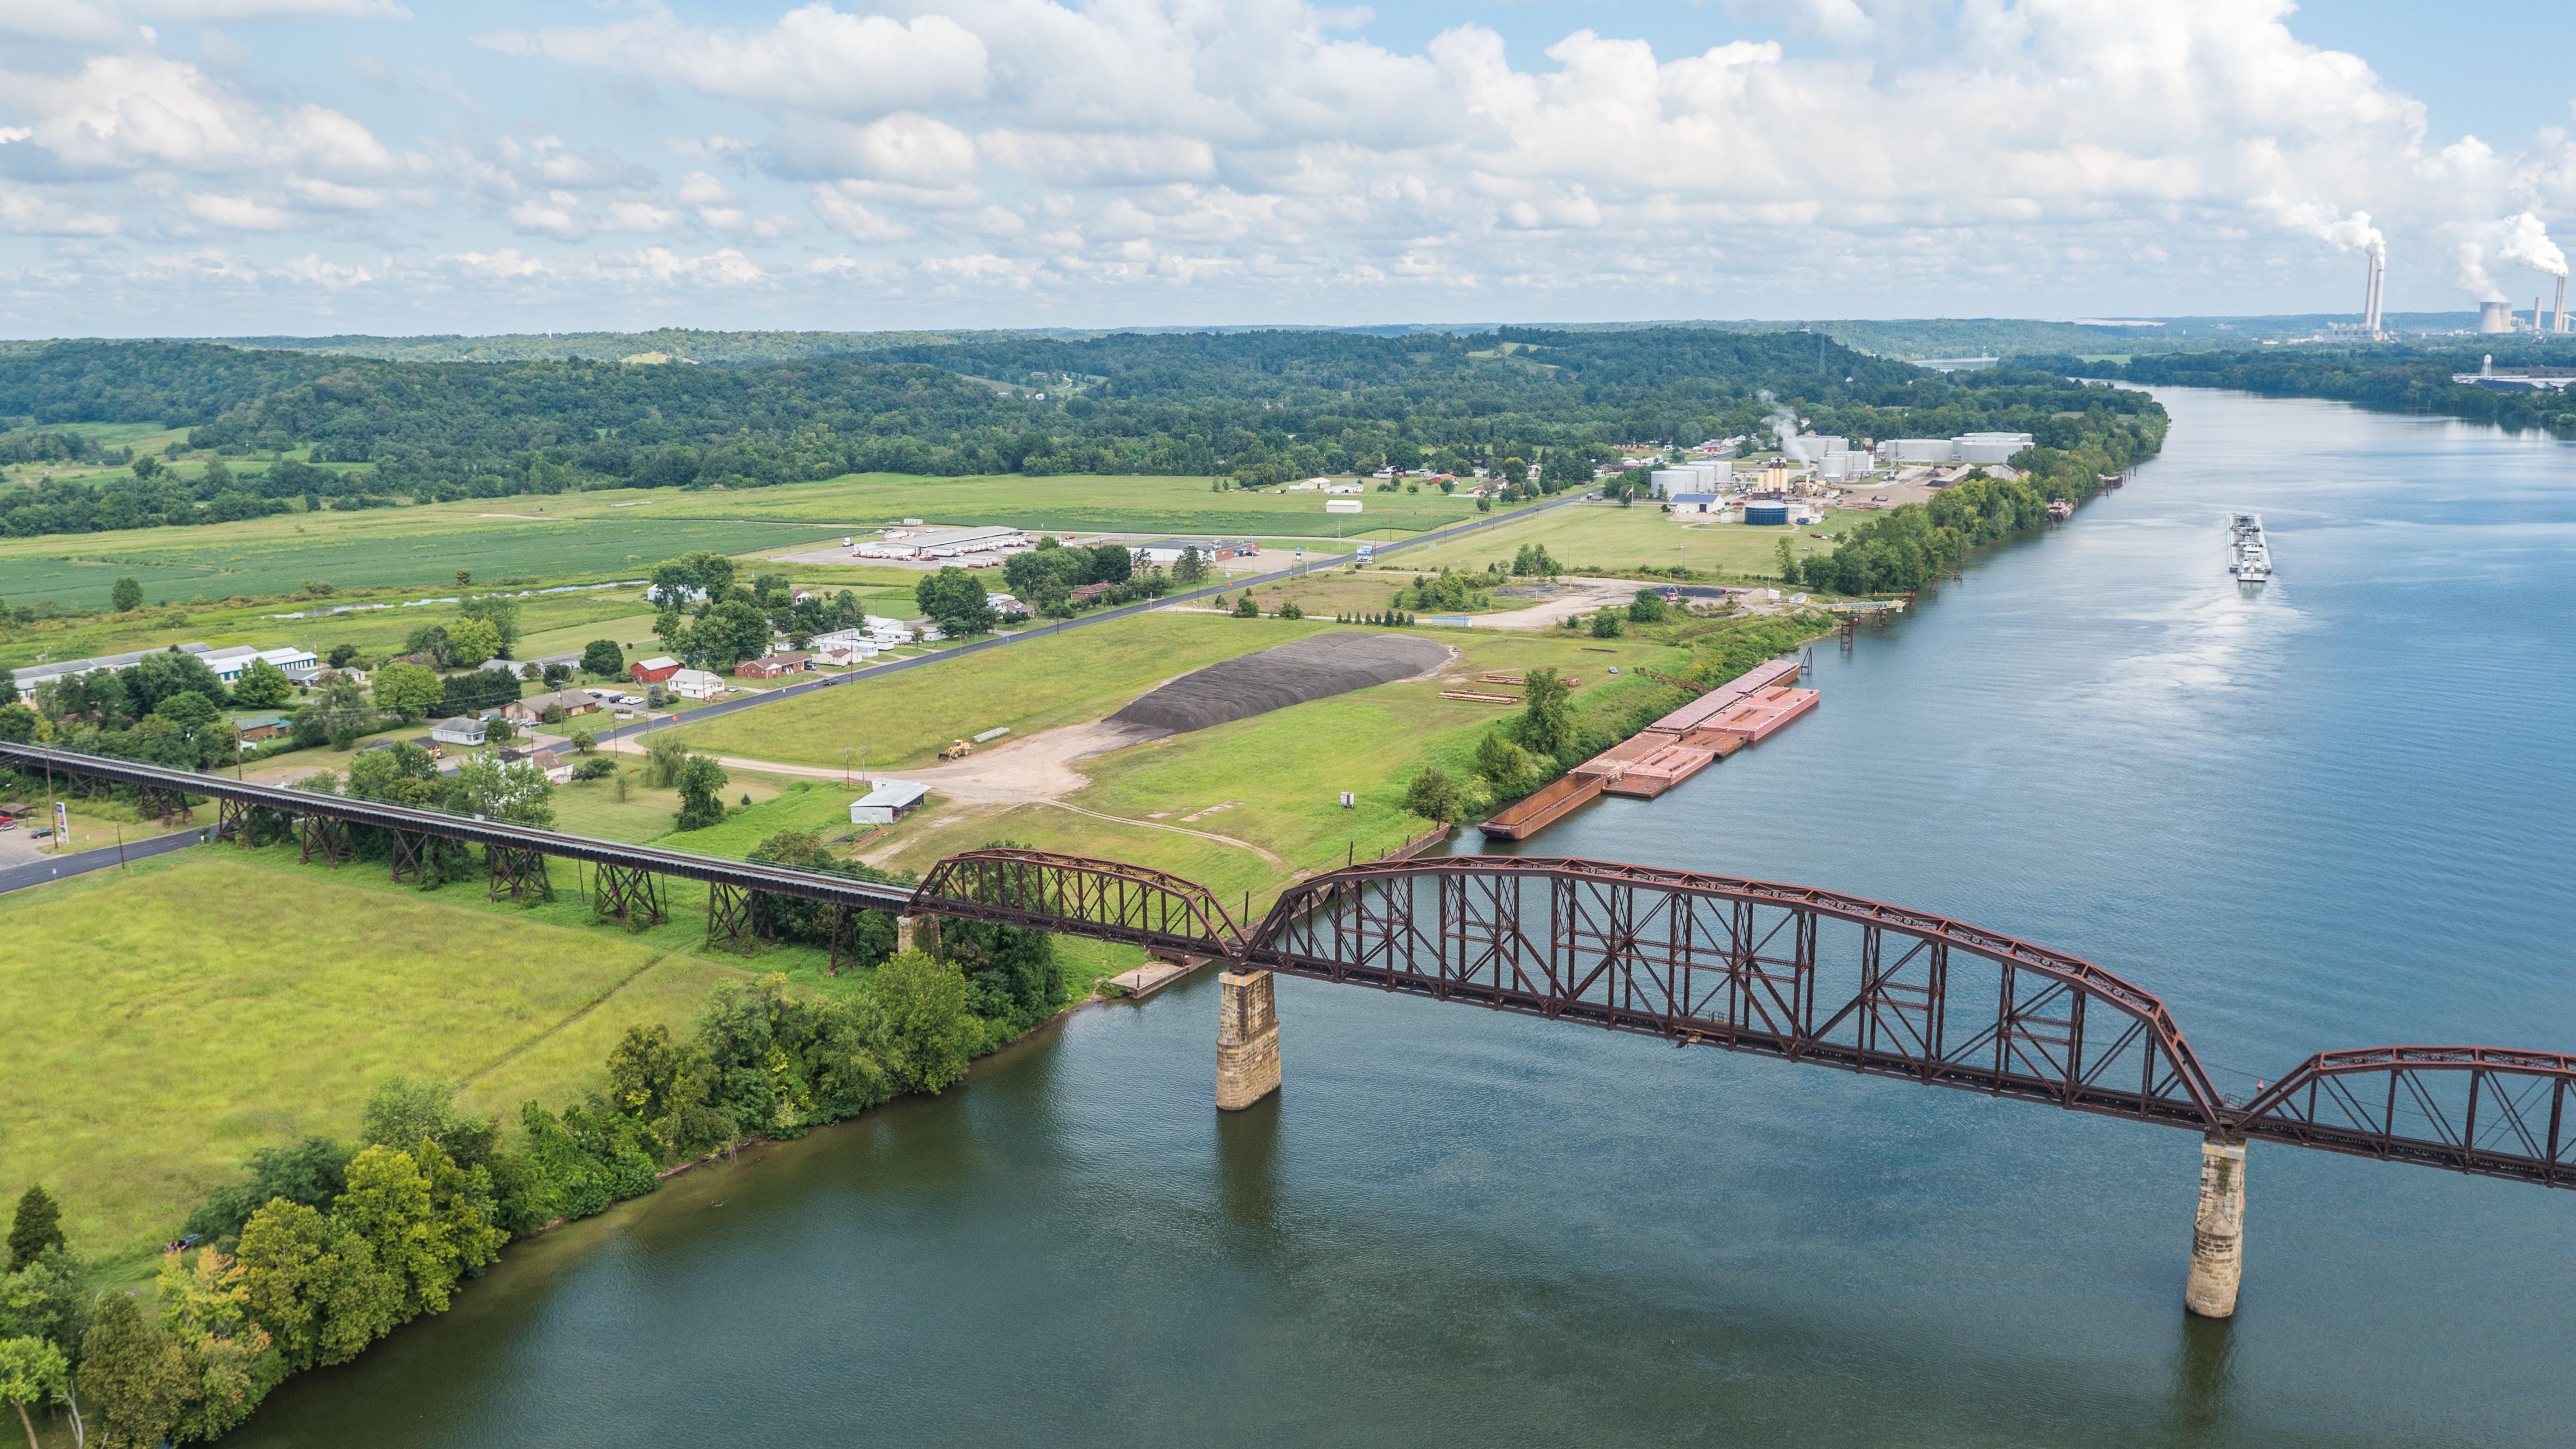 Aerial image of Bridge Fleet